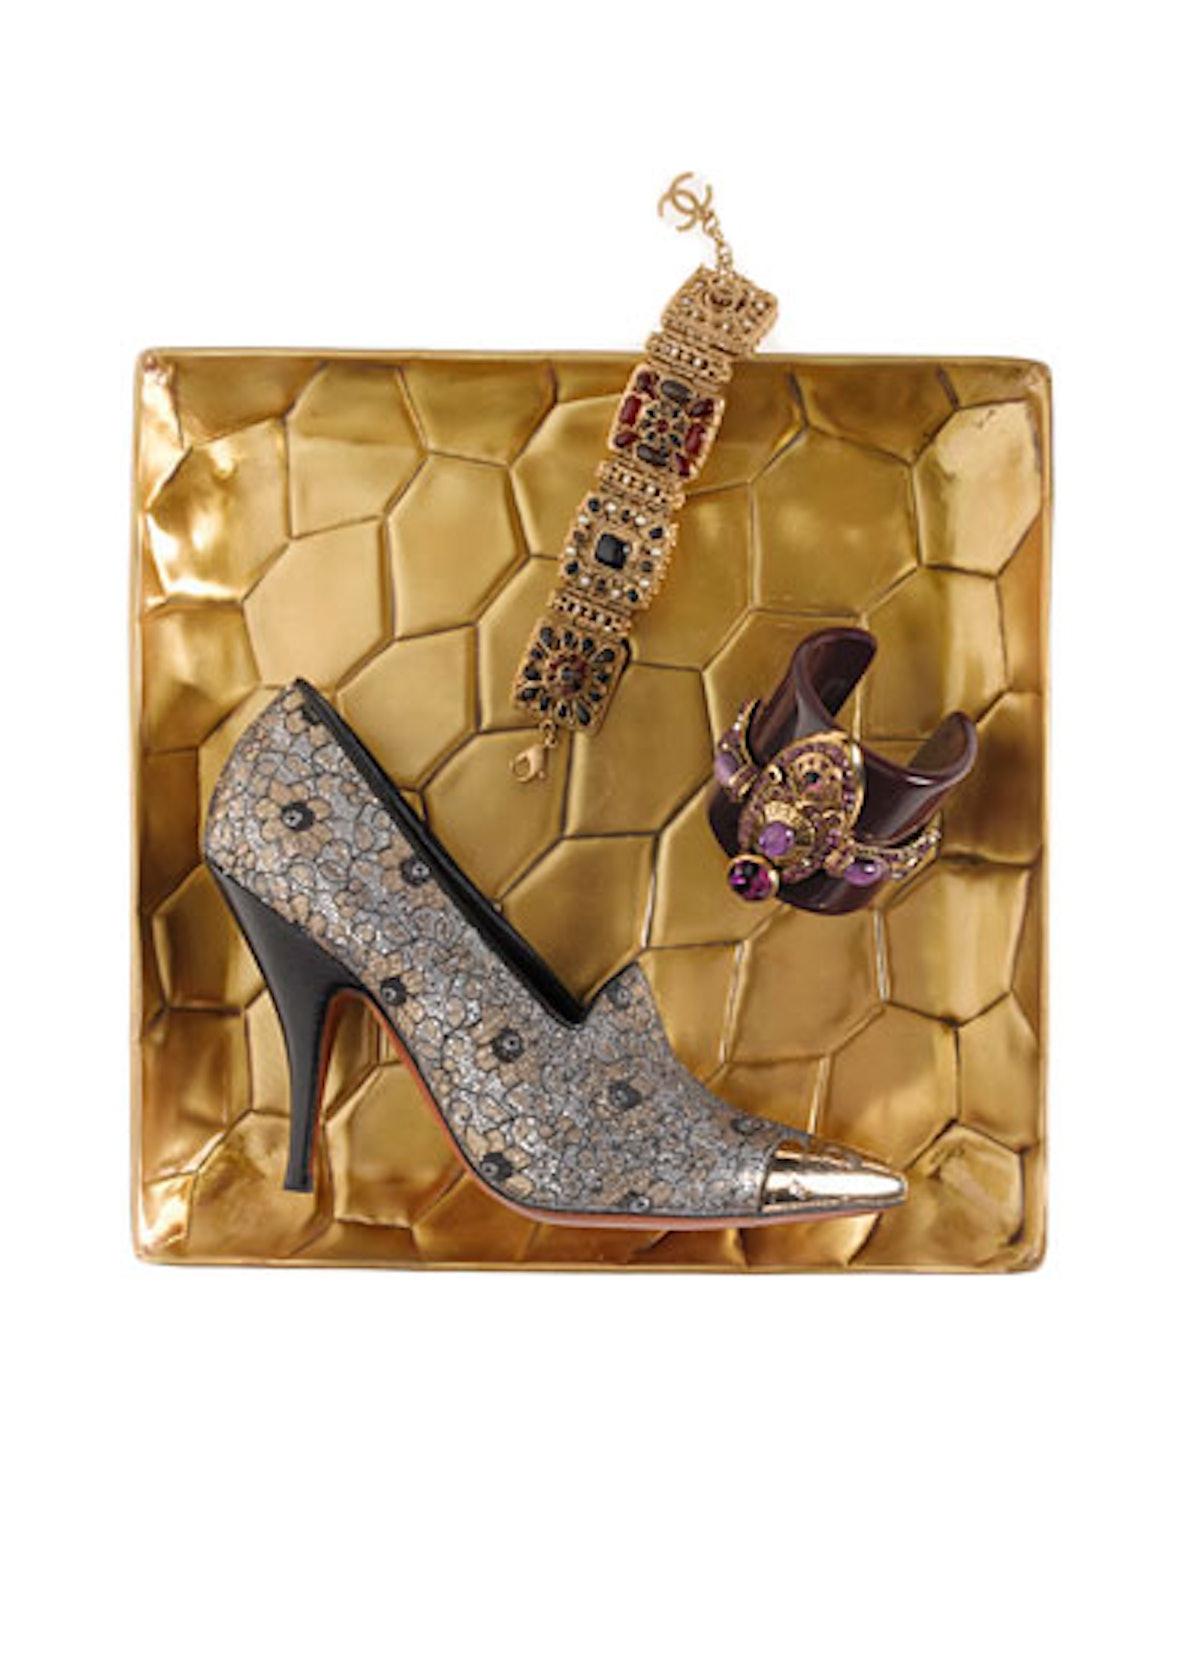 acss-baroque-accessories-06-v.jpg